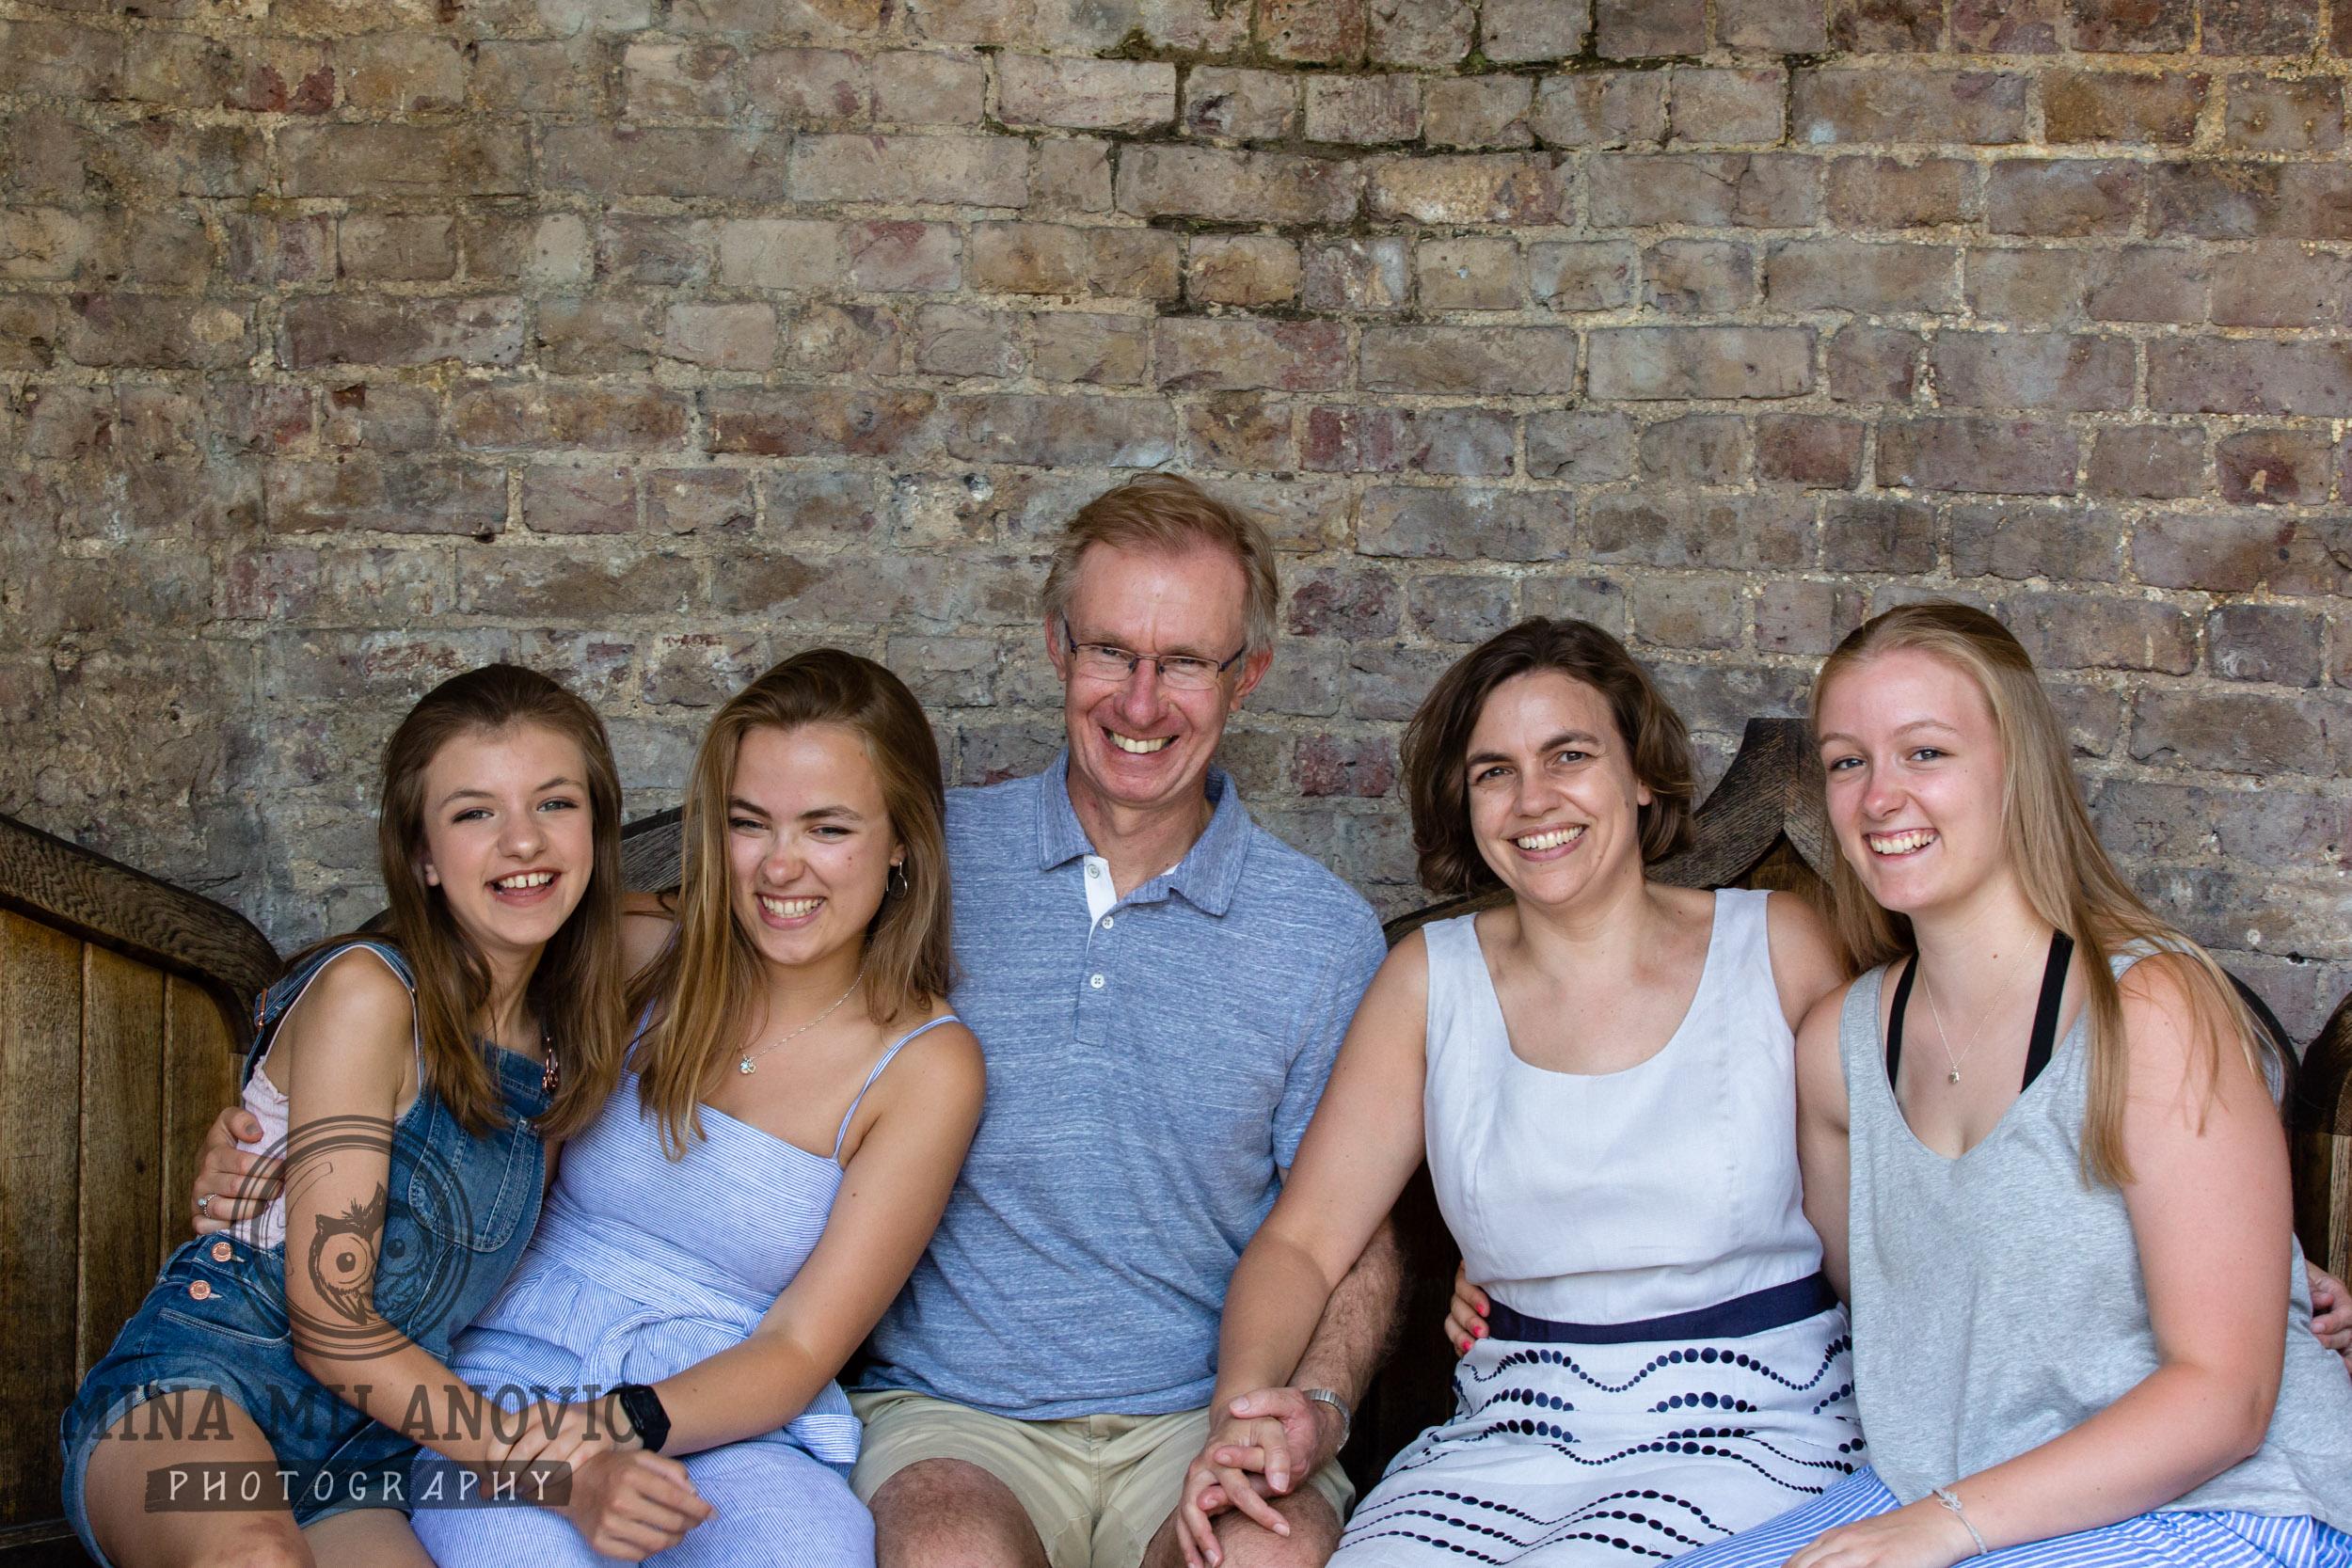 Richmond-upon-Thames Family Photographer